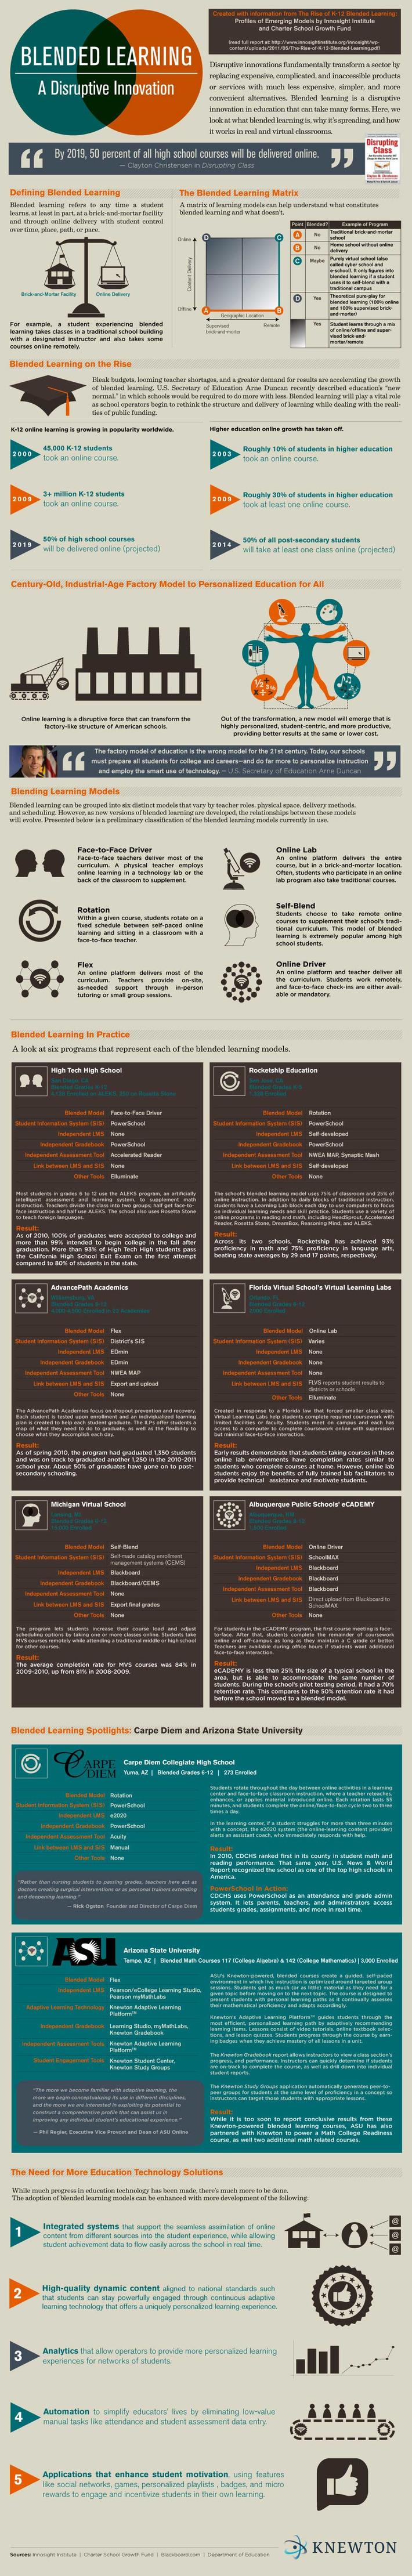 Blended Learning: The MOOC | Digital | Digital ... | Social Learning - MOOC - OER | Scoop.it